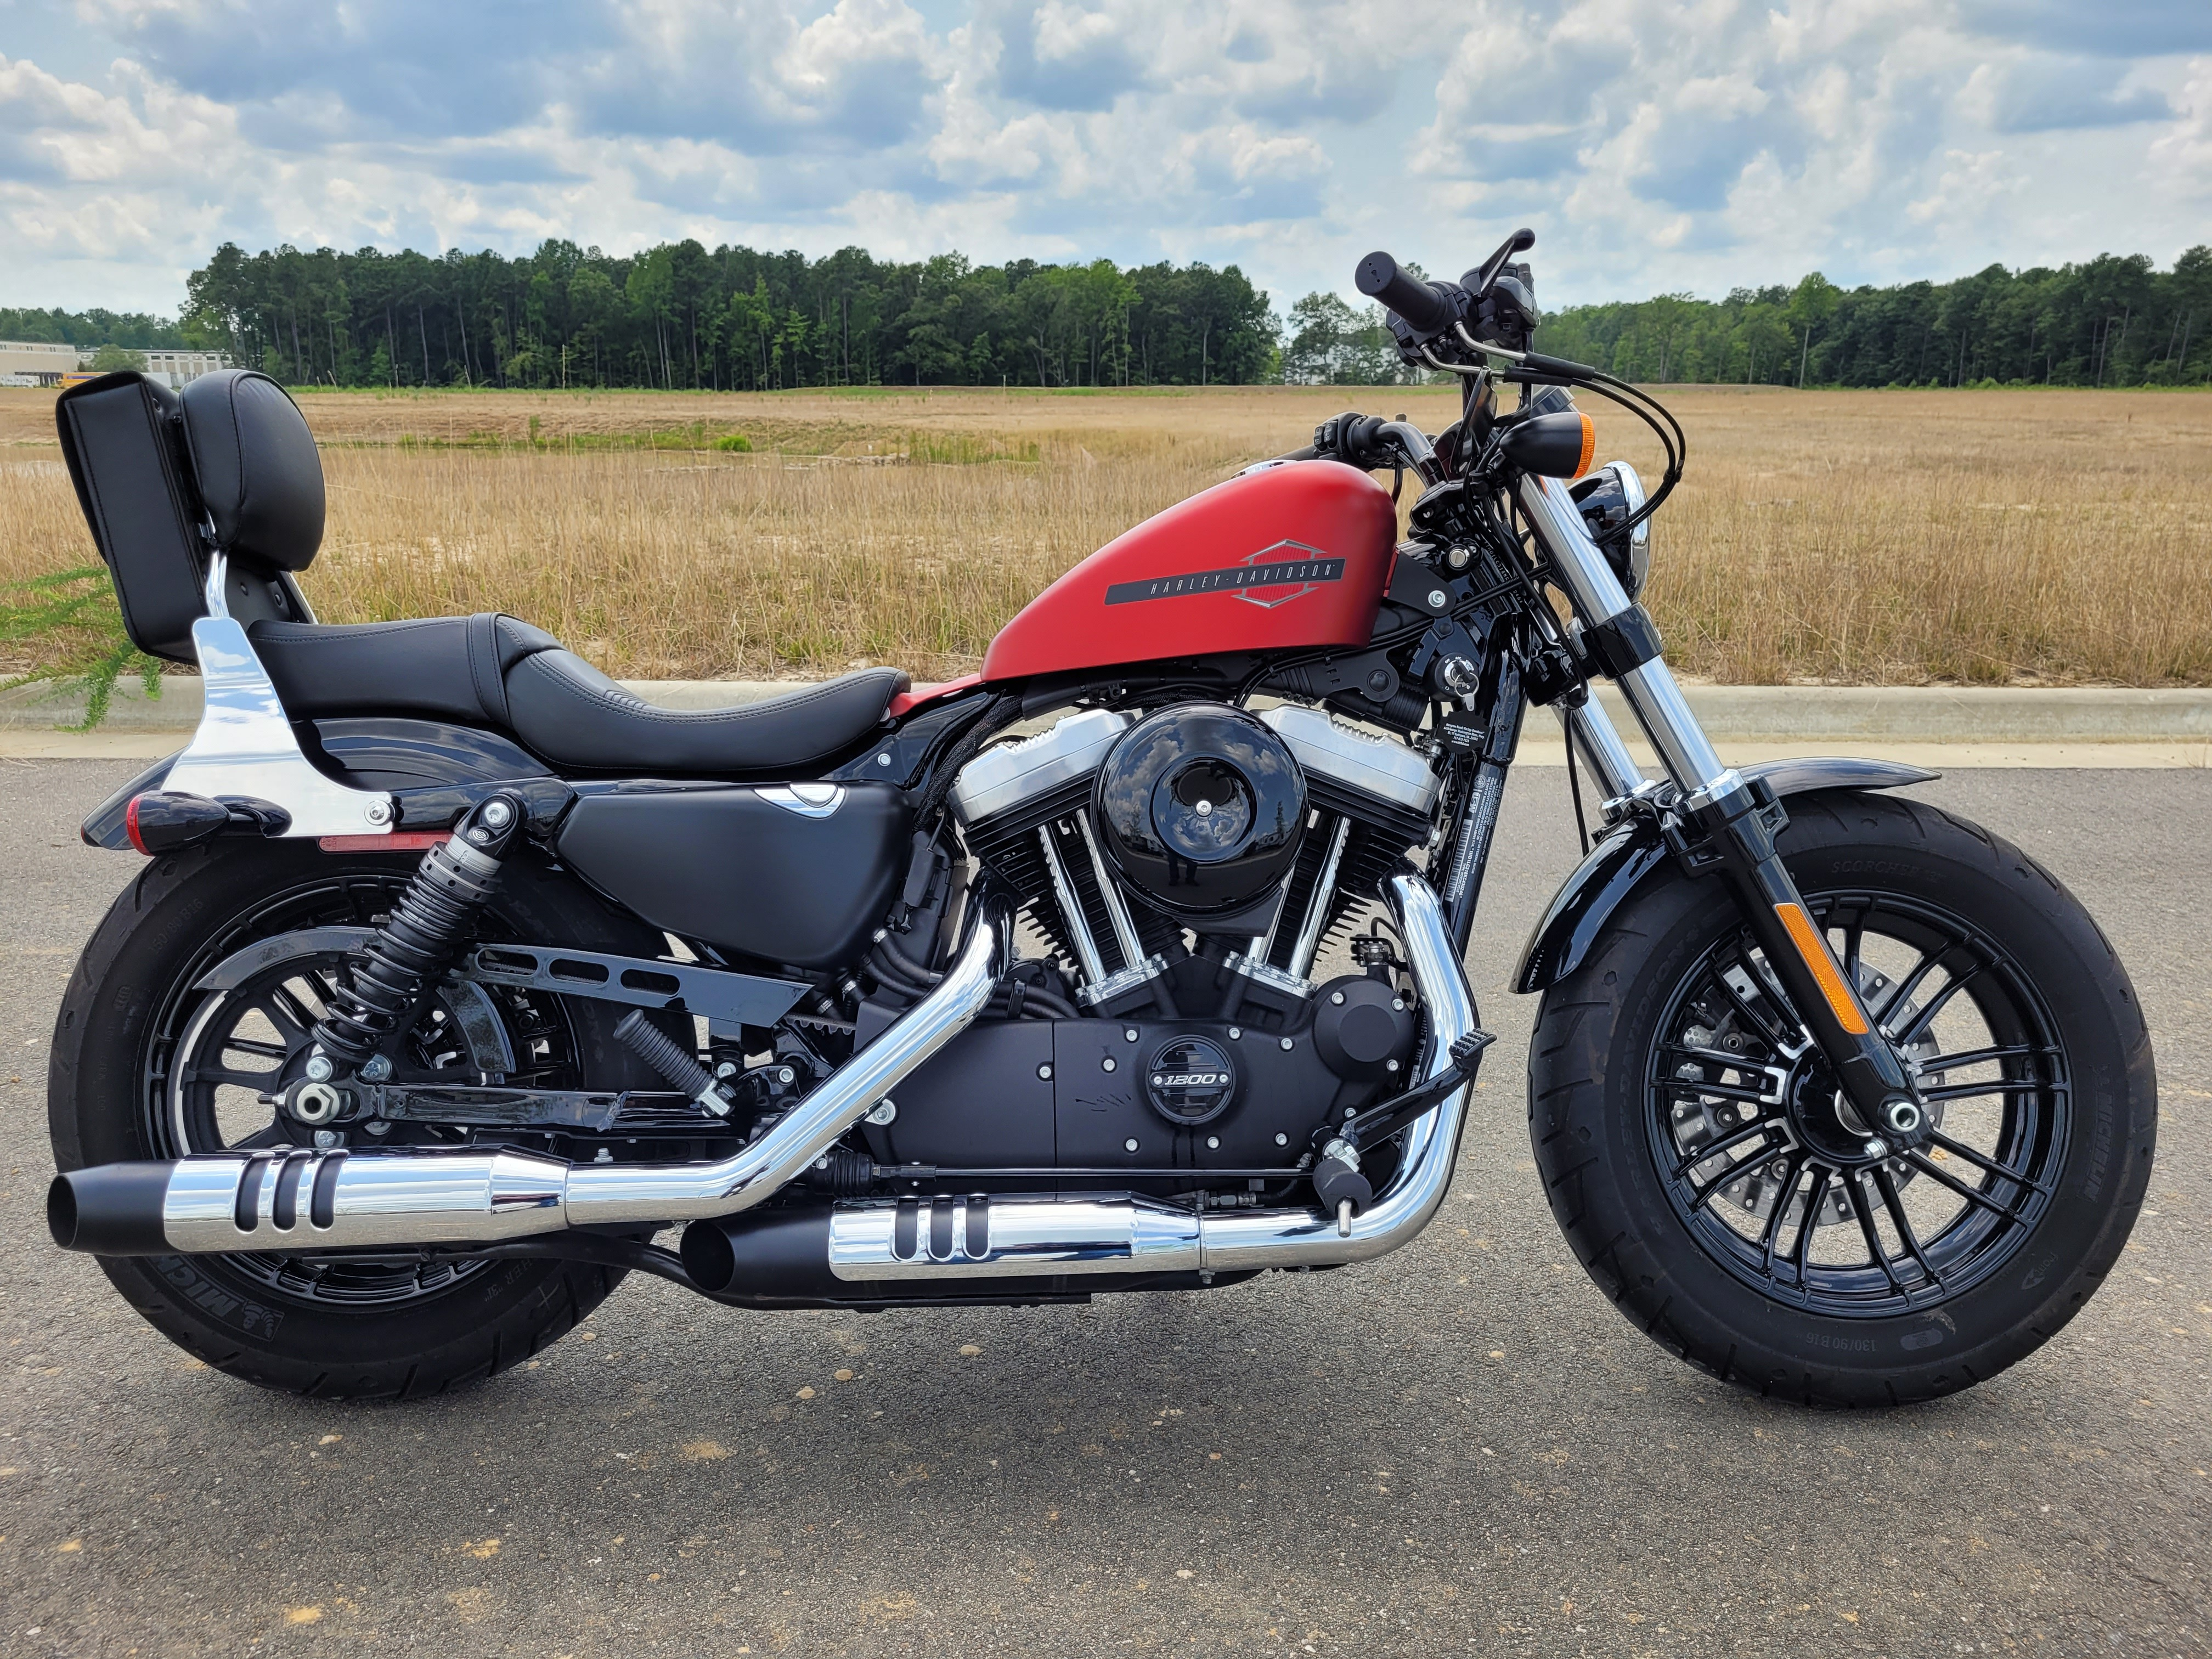 2019 Harley-Davidson Sportster Forty-Eight at Richmond Harley-Davidson